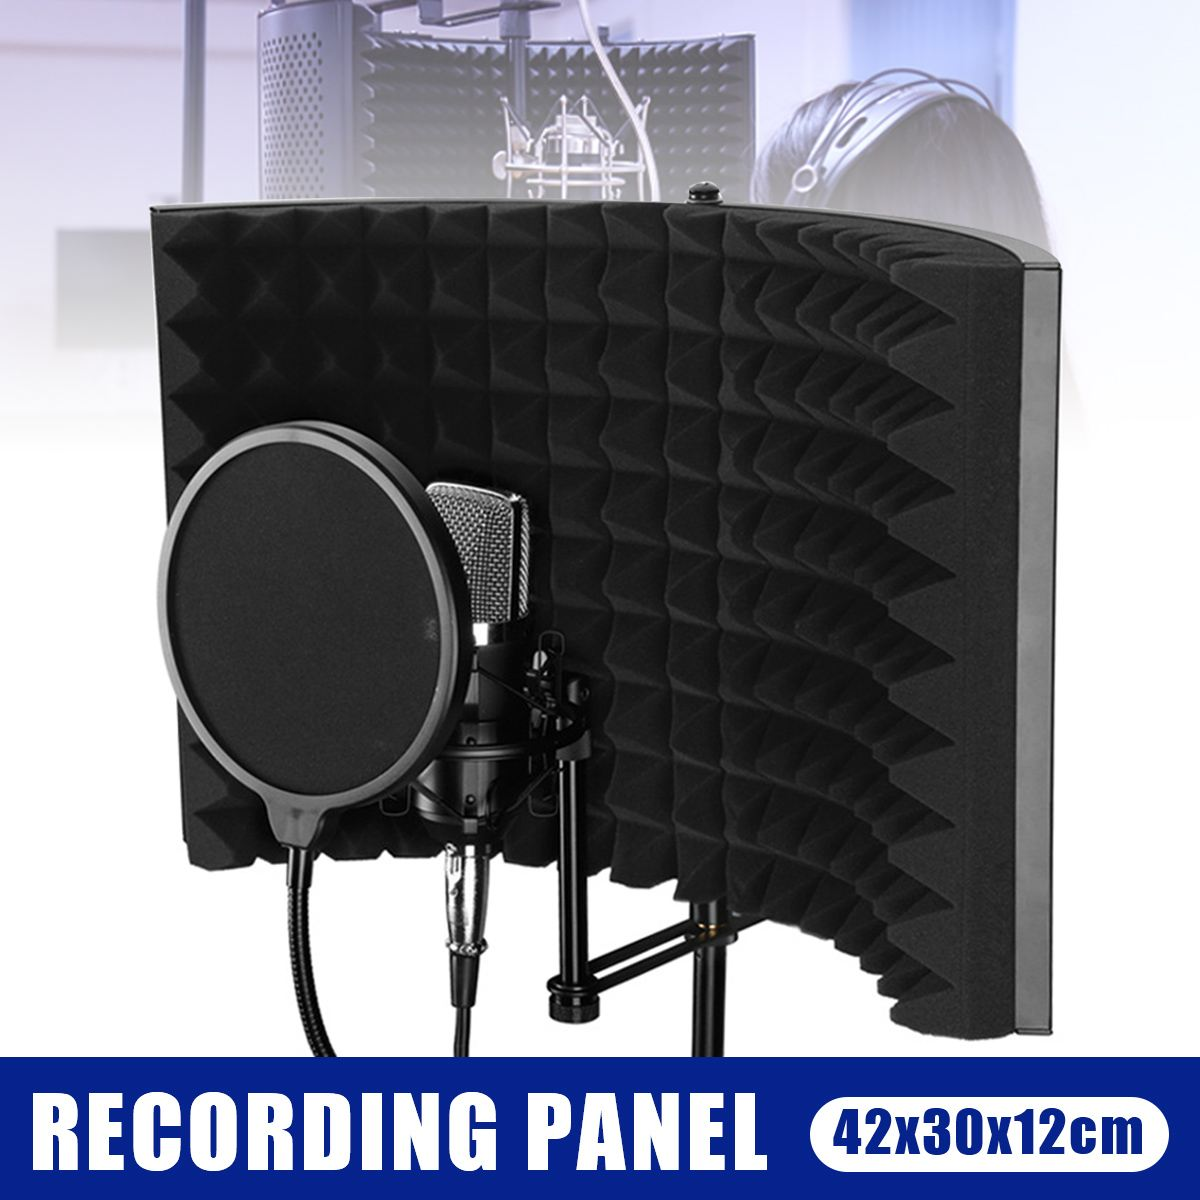 Aluminum Foldable Isolation Shield Sound Absorber Foam Shield Vocal Booth Recording Panel Studio Soundproof Sponge